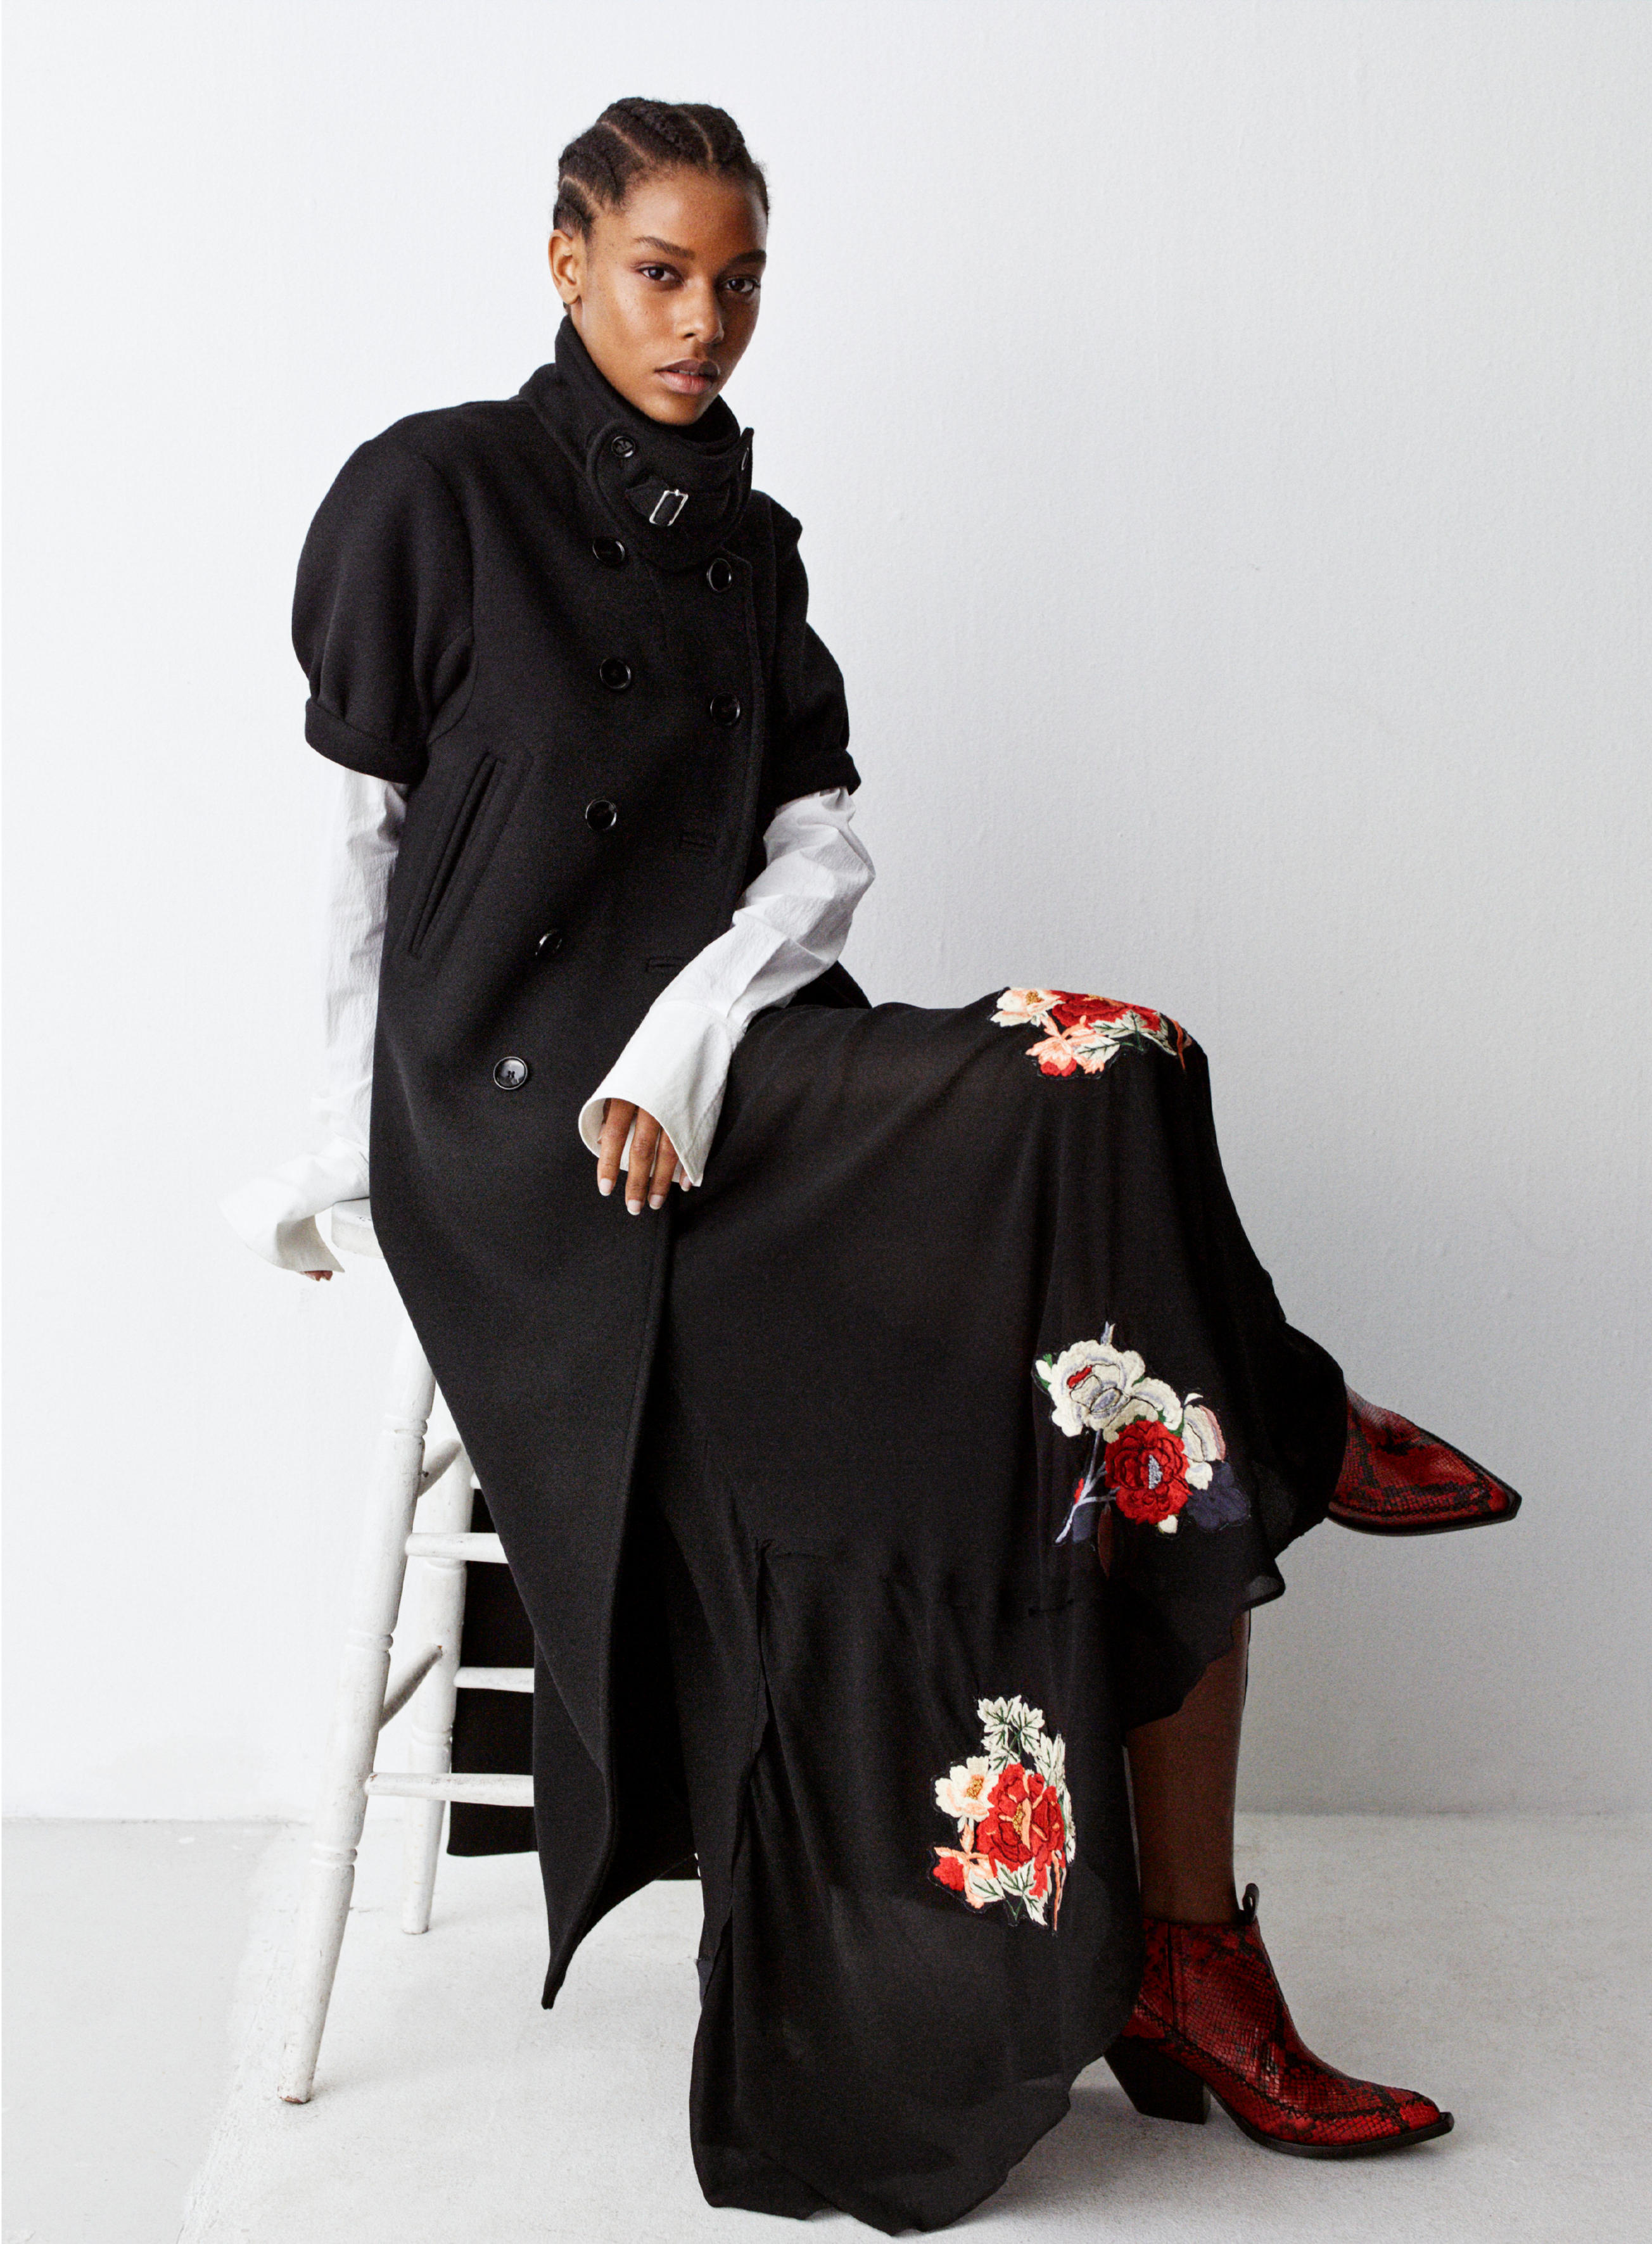 H&M Studio Fall Winter 2016 Women's Lookbook (2)